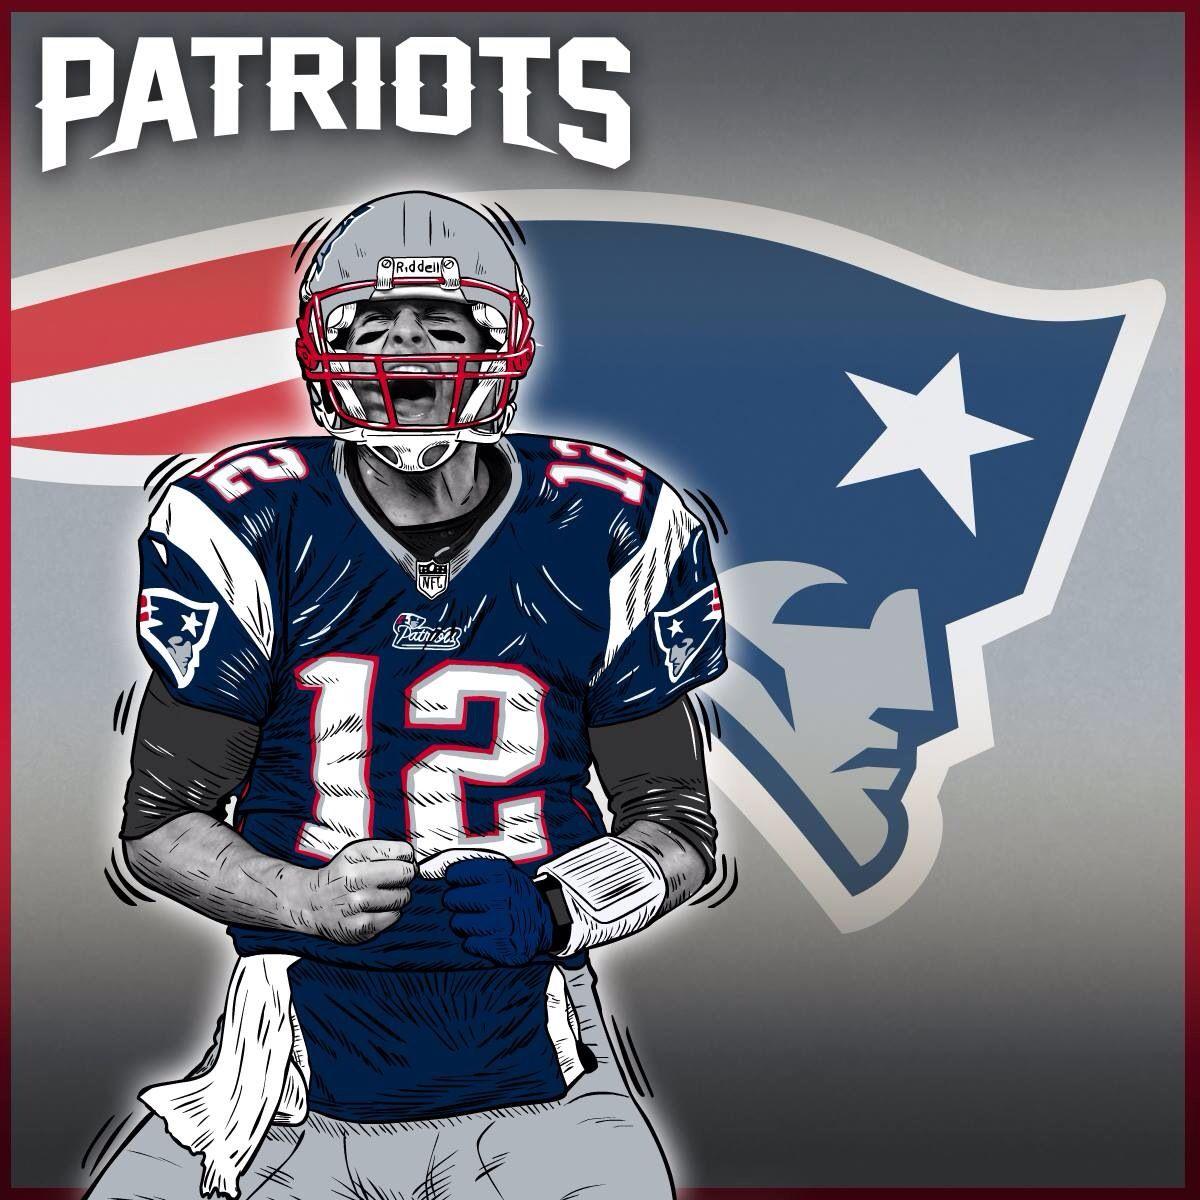 Patriots Nfl Football Tom Brady 12 New England Kickoff New England Patriots Patriots Team England Sports